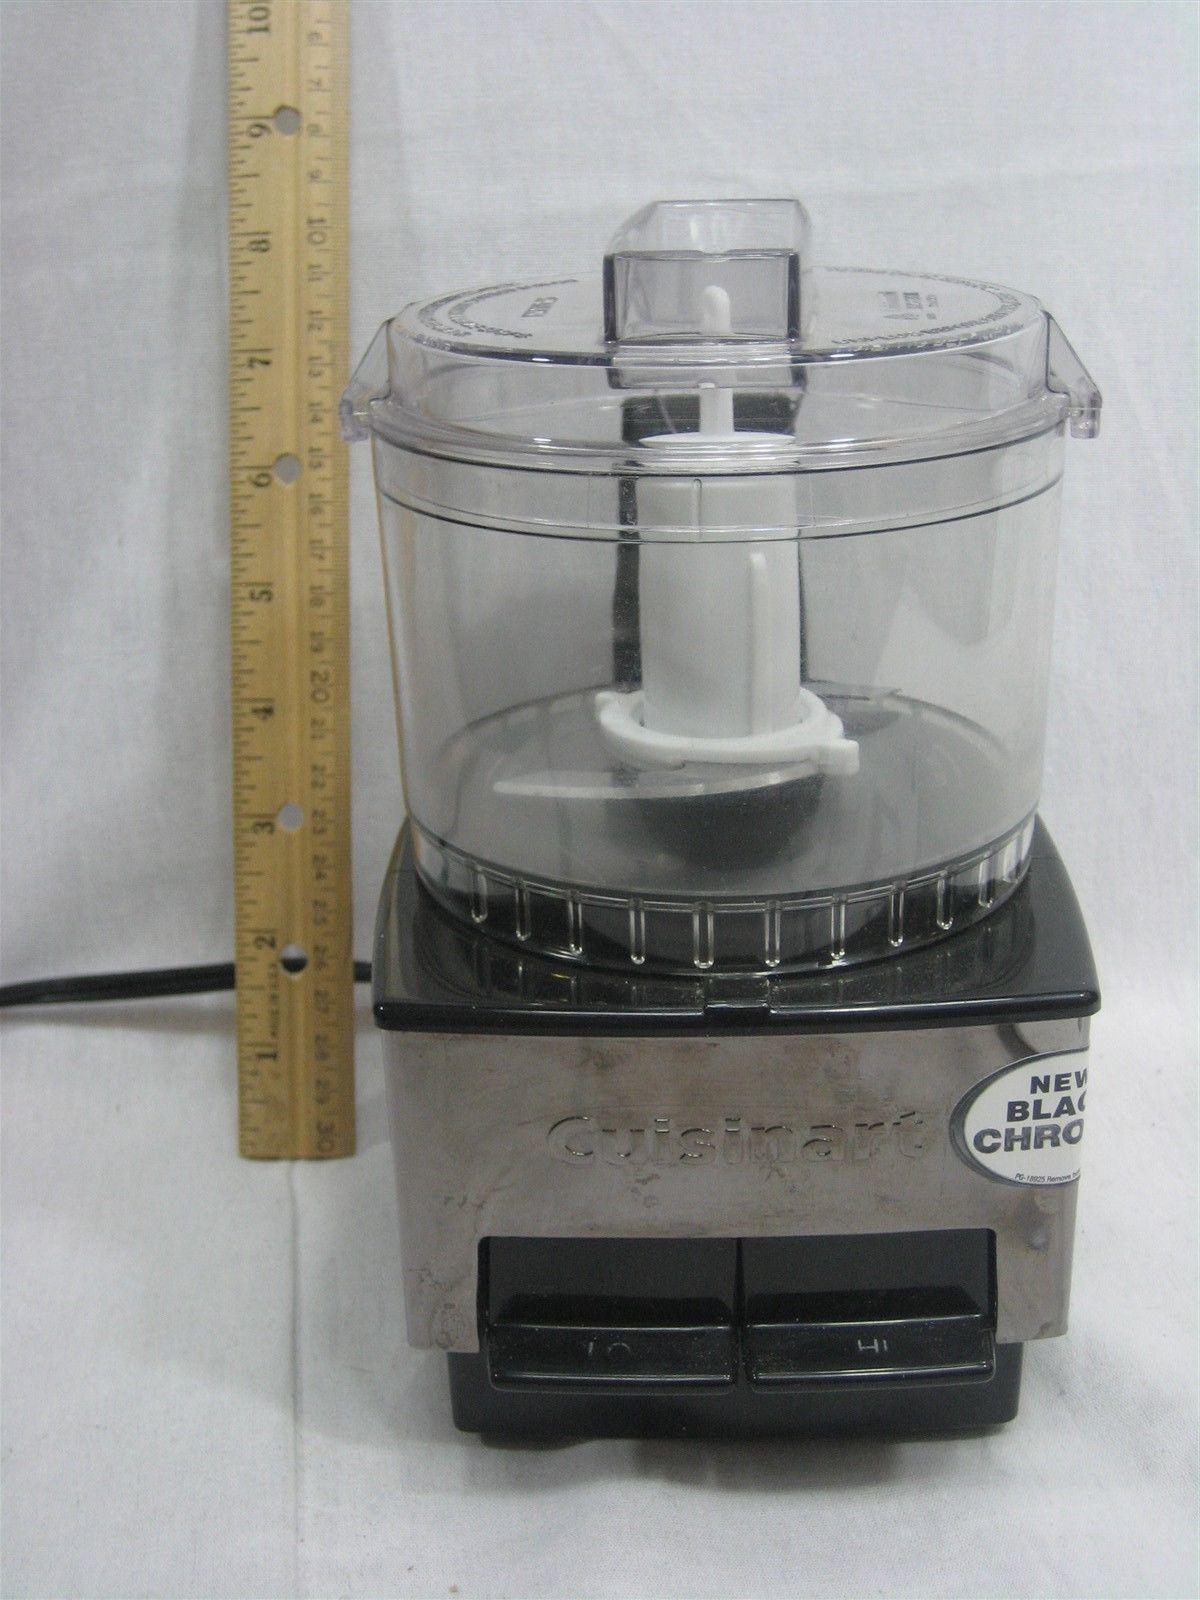 Cuisinart Mini-Prep Food Processor Black Chrome Series 21 Ounce Model DLC-1SS